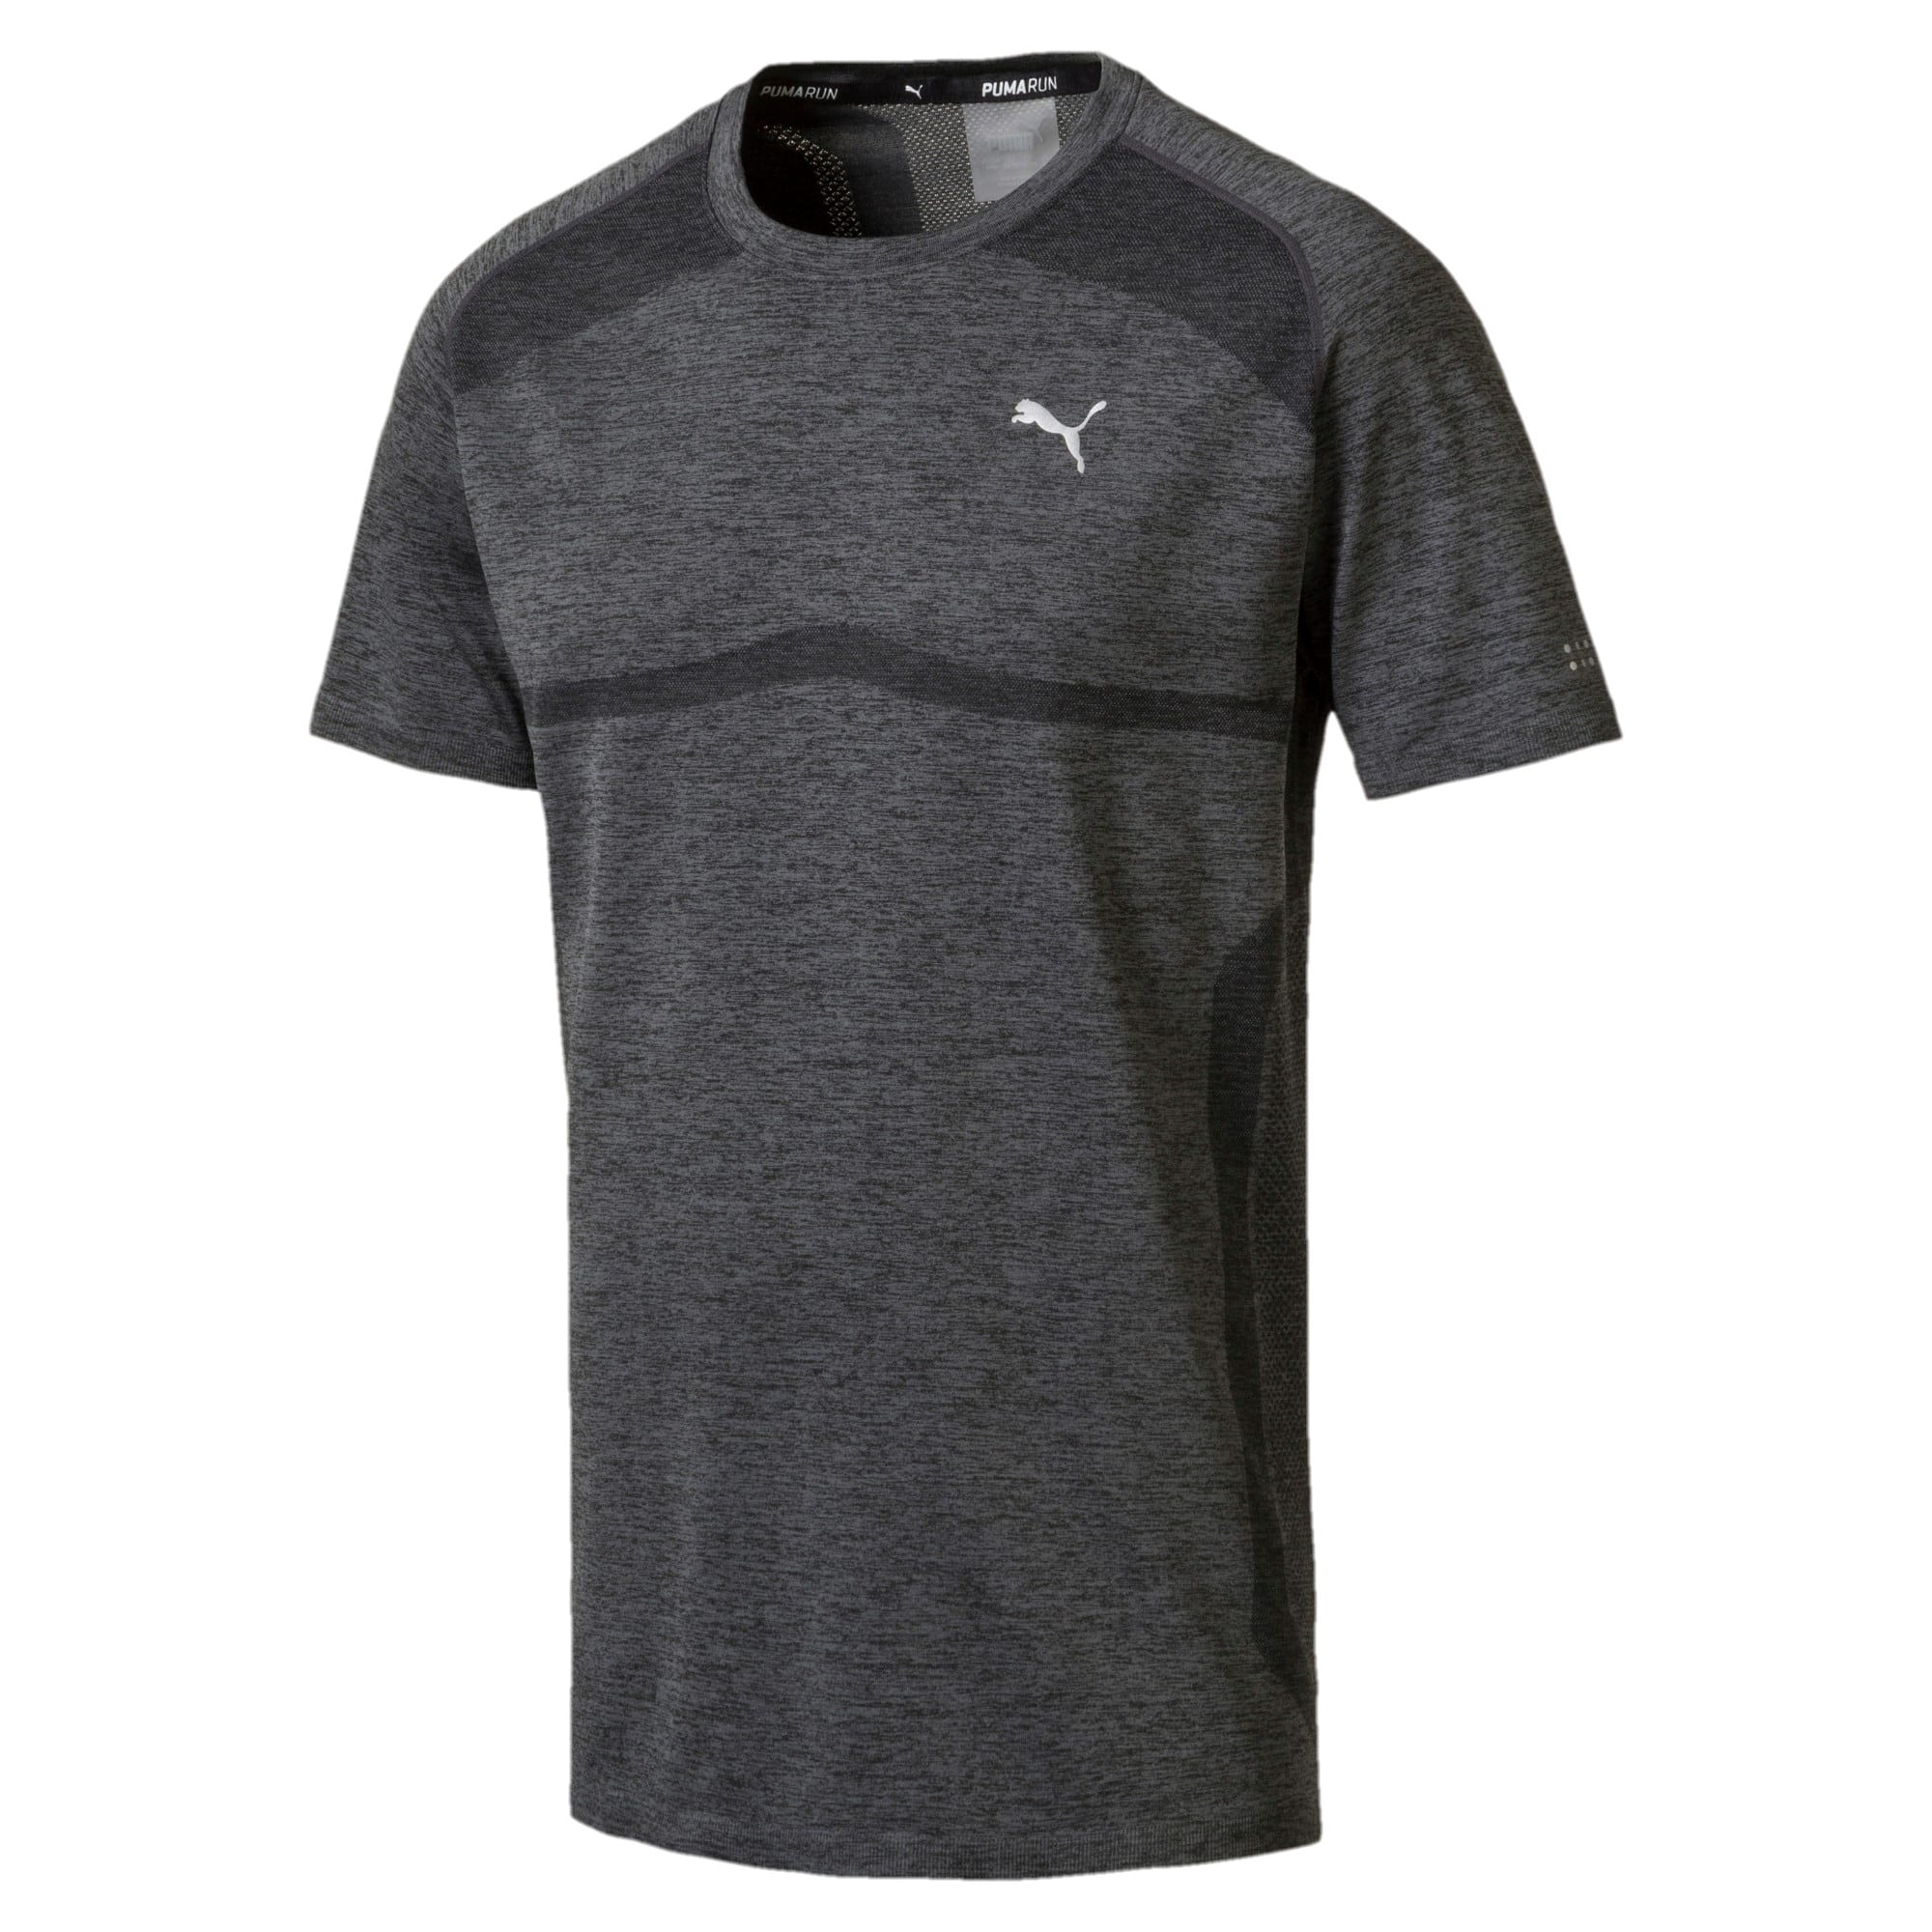 Thumbnail 1 of PWRRUN evoKNIT Men's Short Sleeve Running T-Shirt, Dark Gray Heather, medium-IND